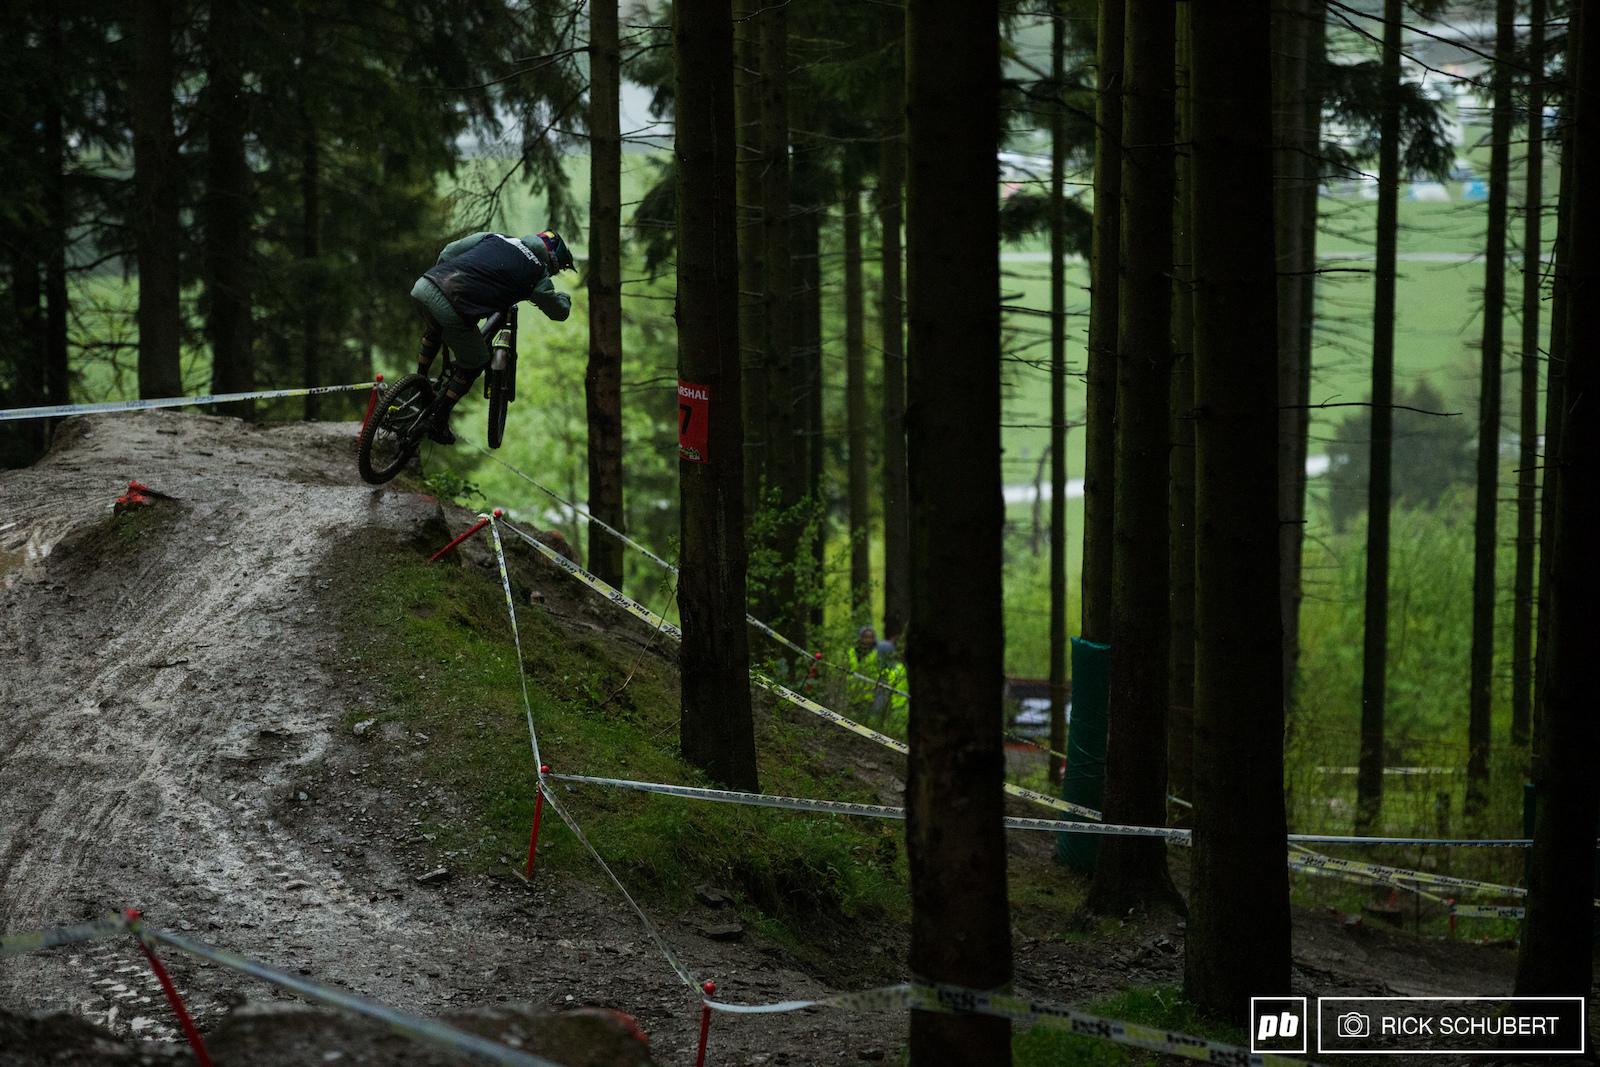 Jasper Jauch hits the corner jump into a steep chute